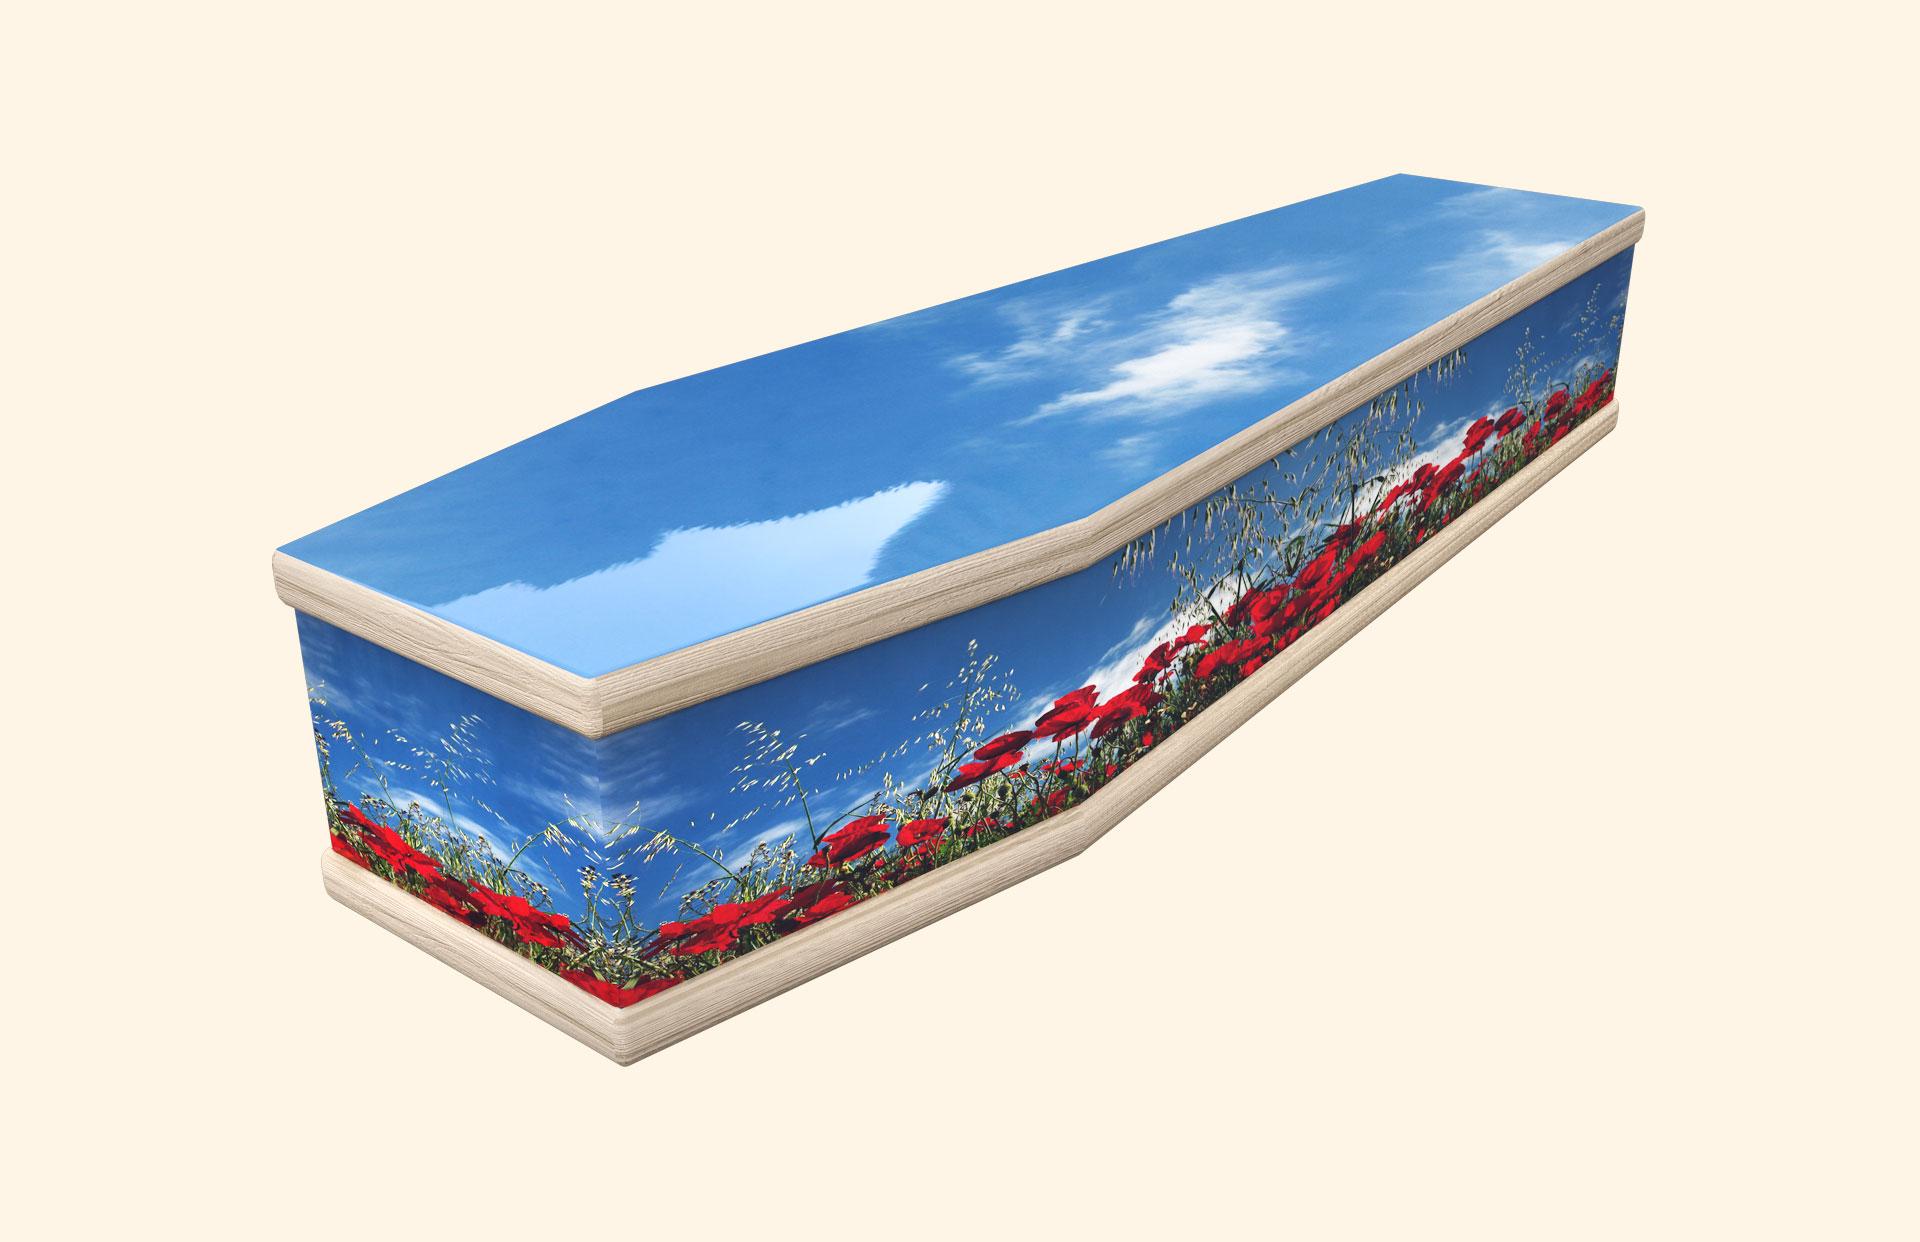 Poppy Wonder Classic coffin